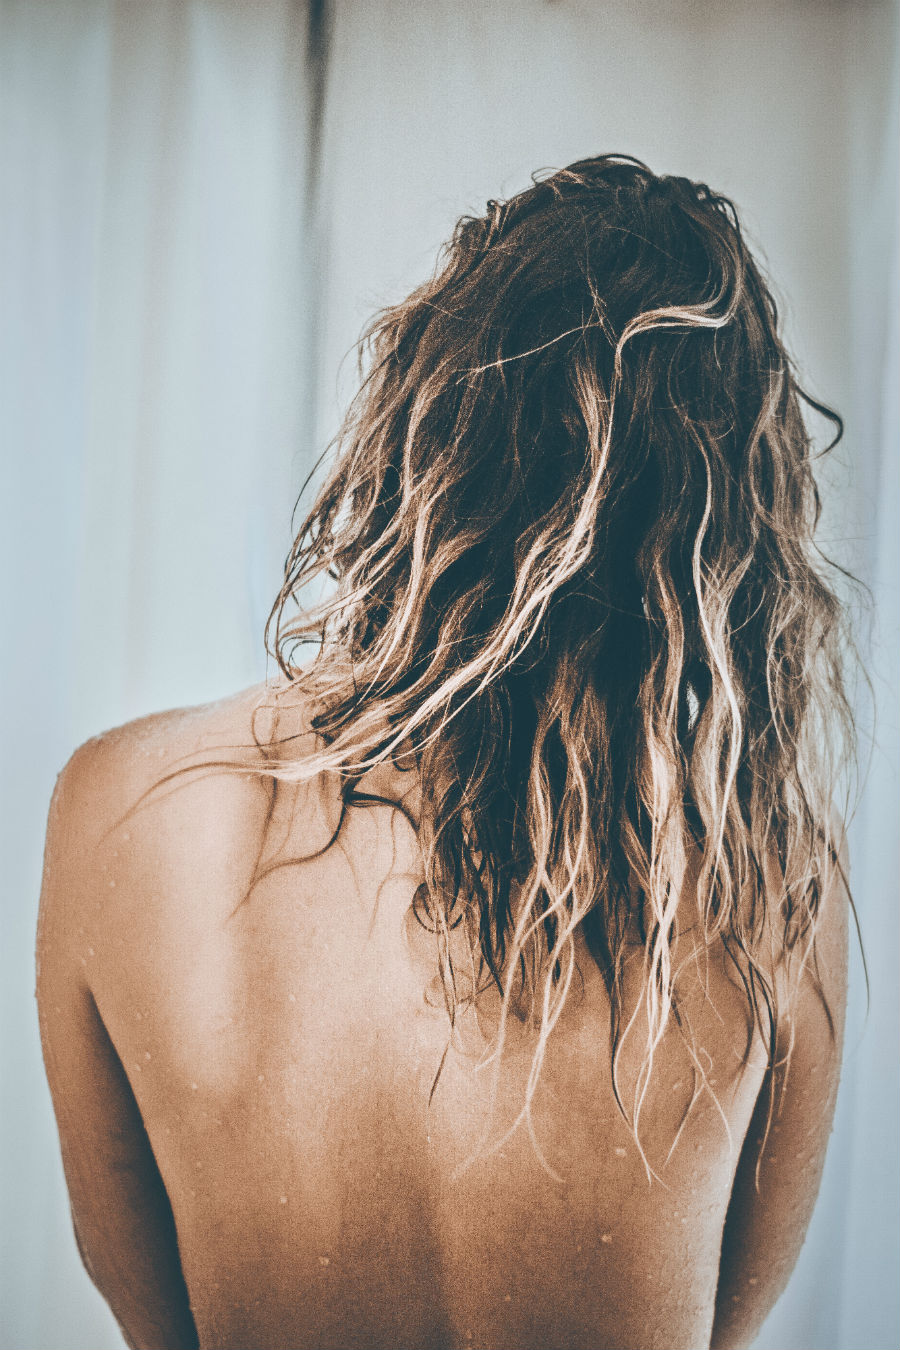 shower after cbd oil massage